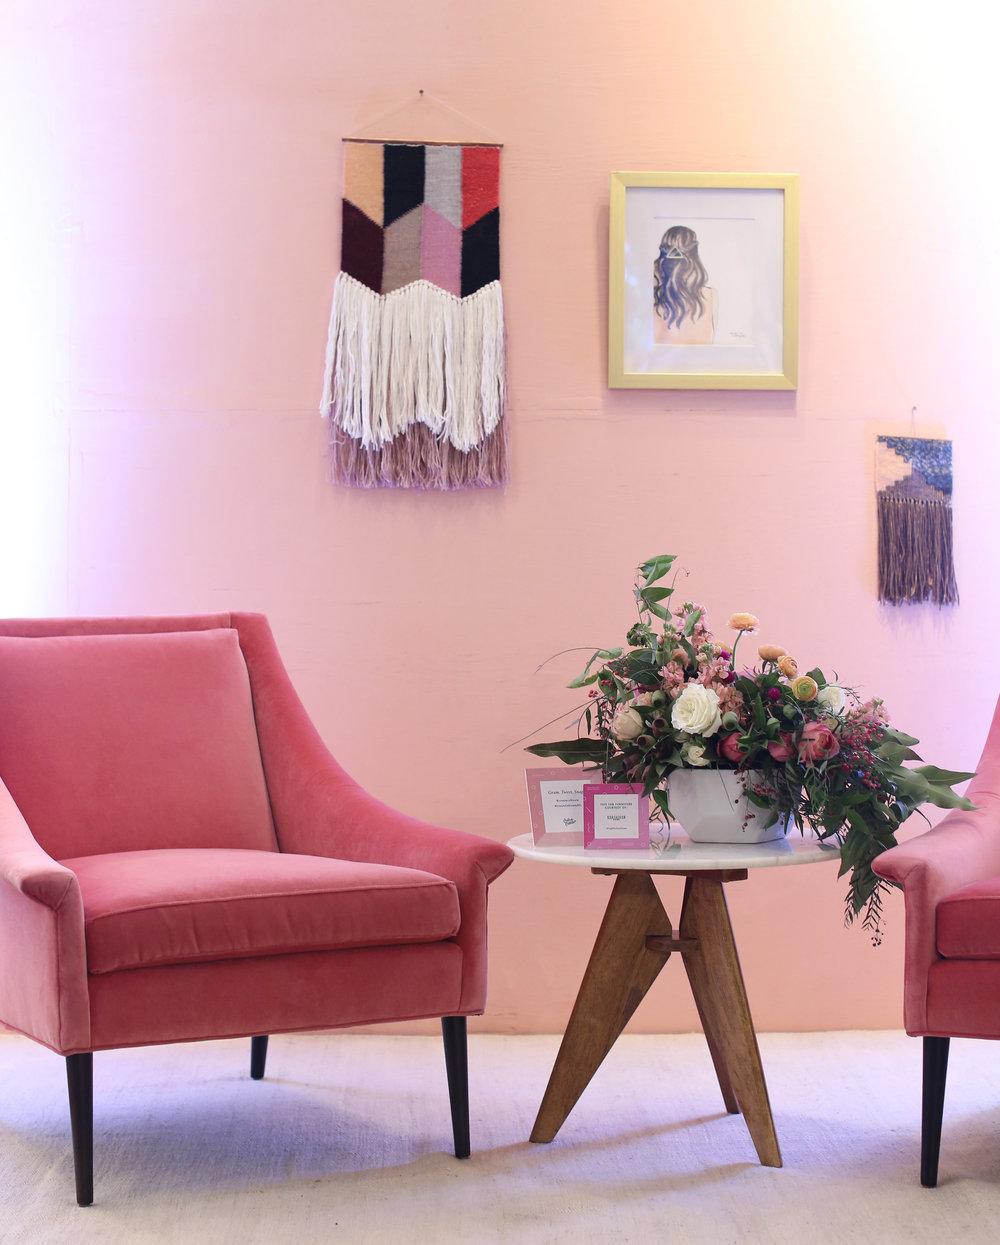 Furniture courtesy of  High Fashion Home , macrame courtesy of  Wabi Sabi Textile Co .